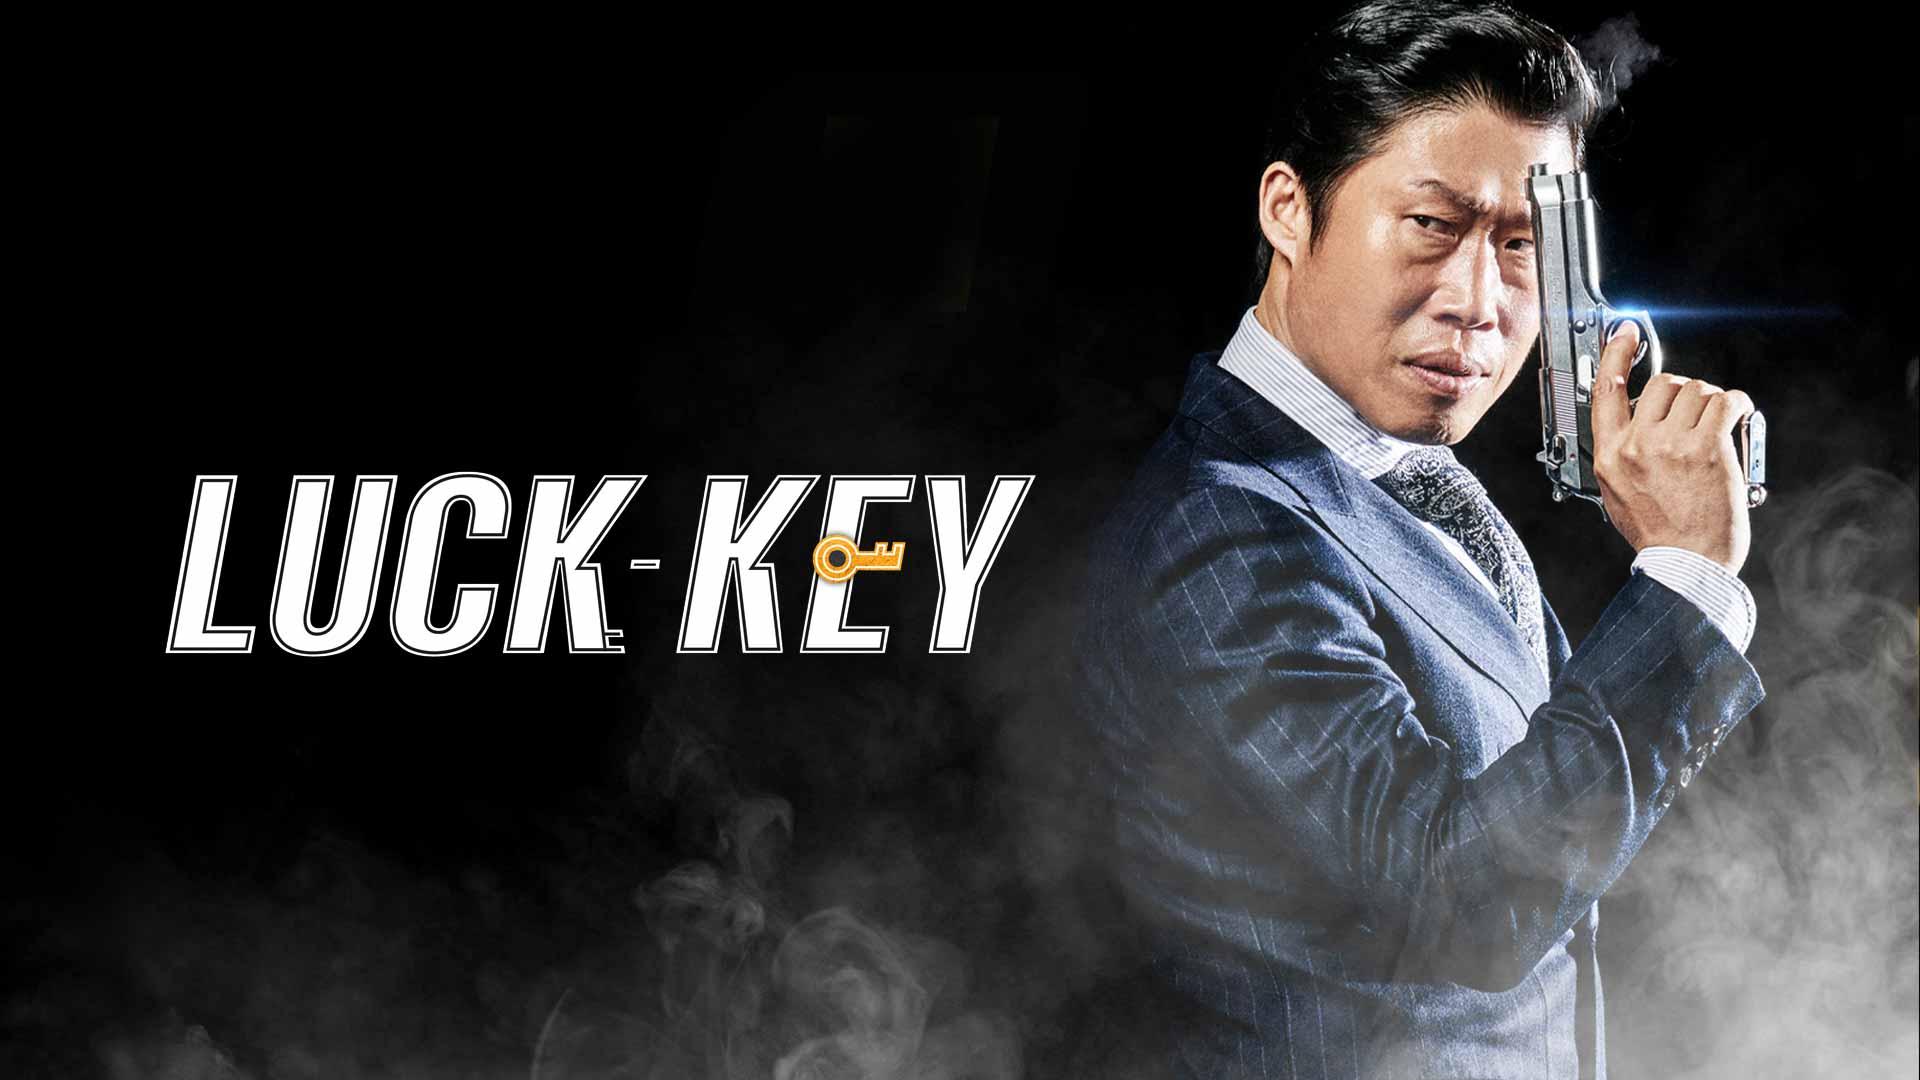 Luck-Key